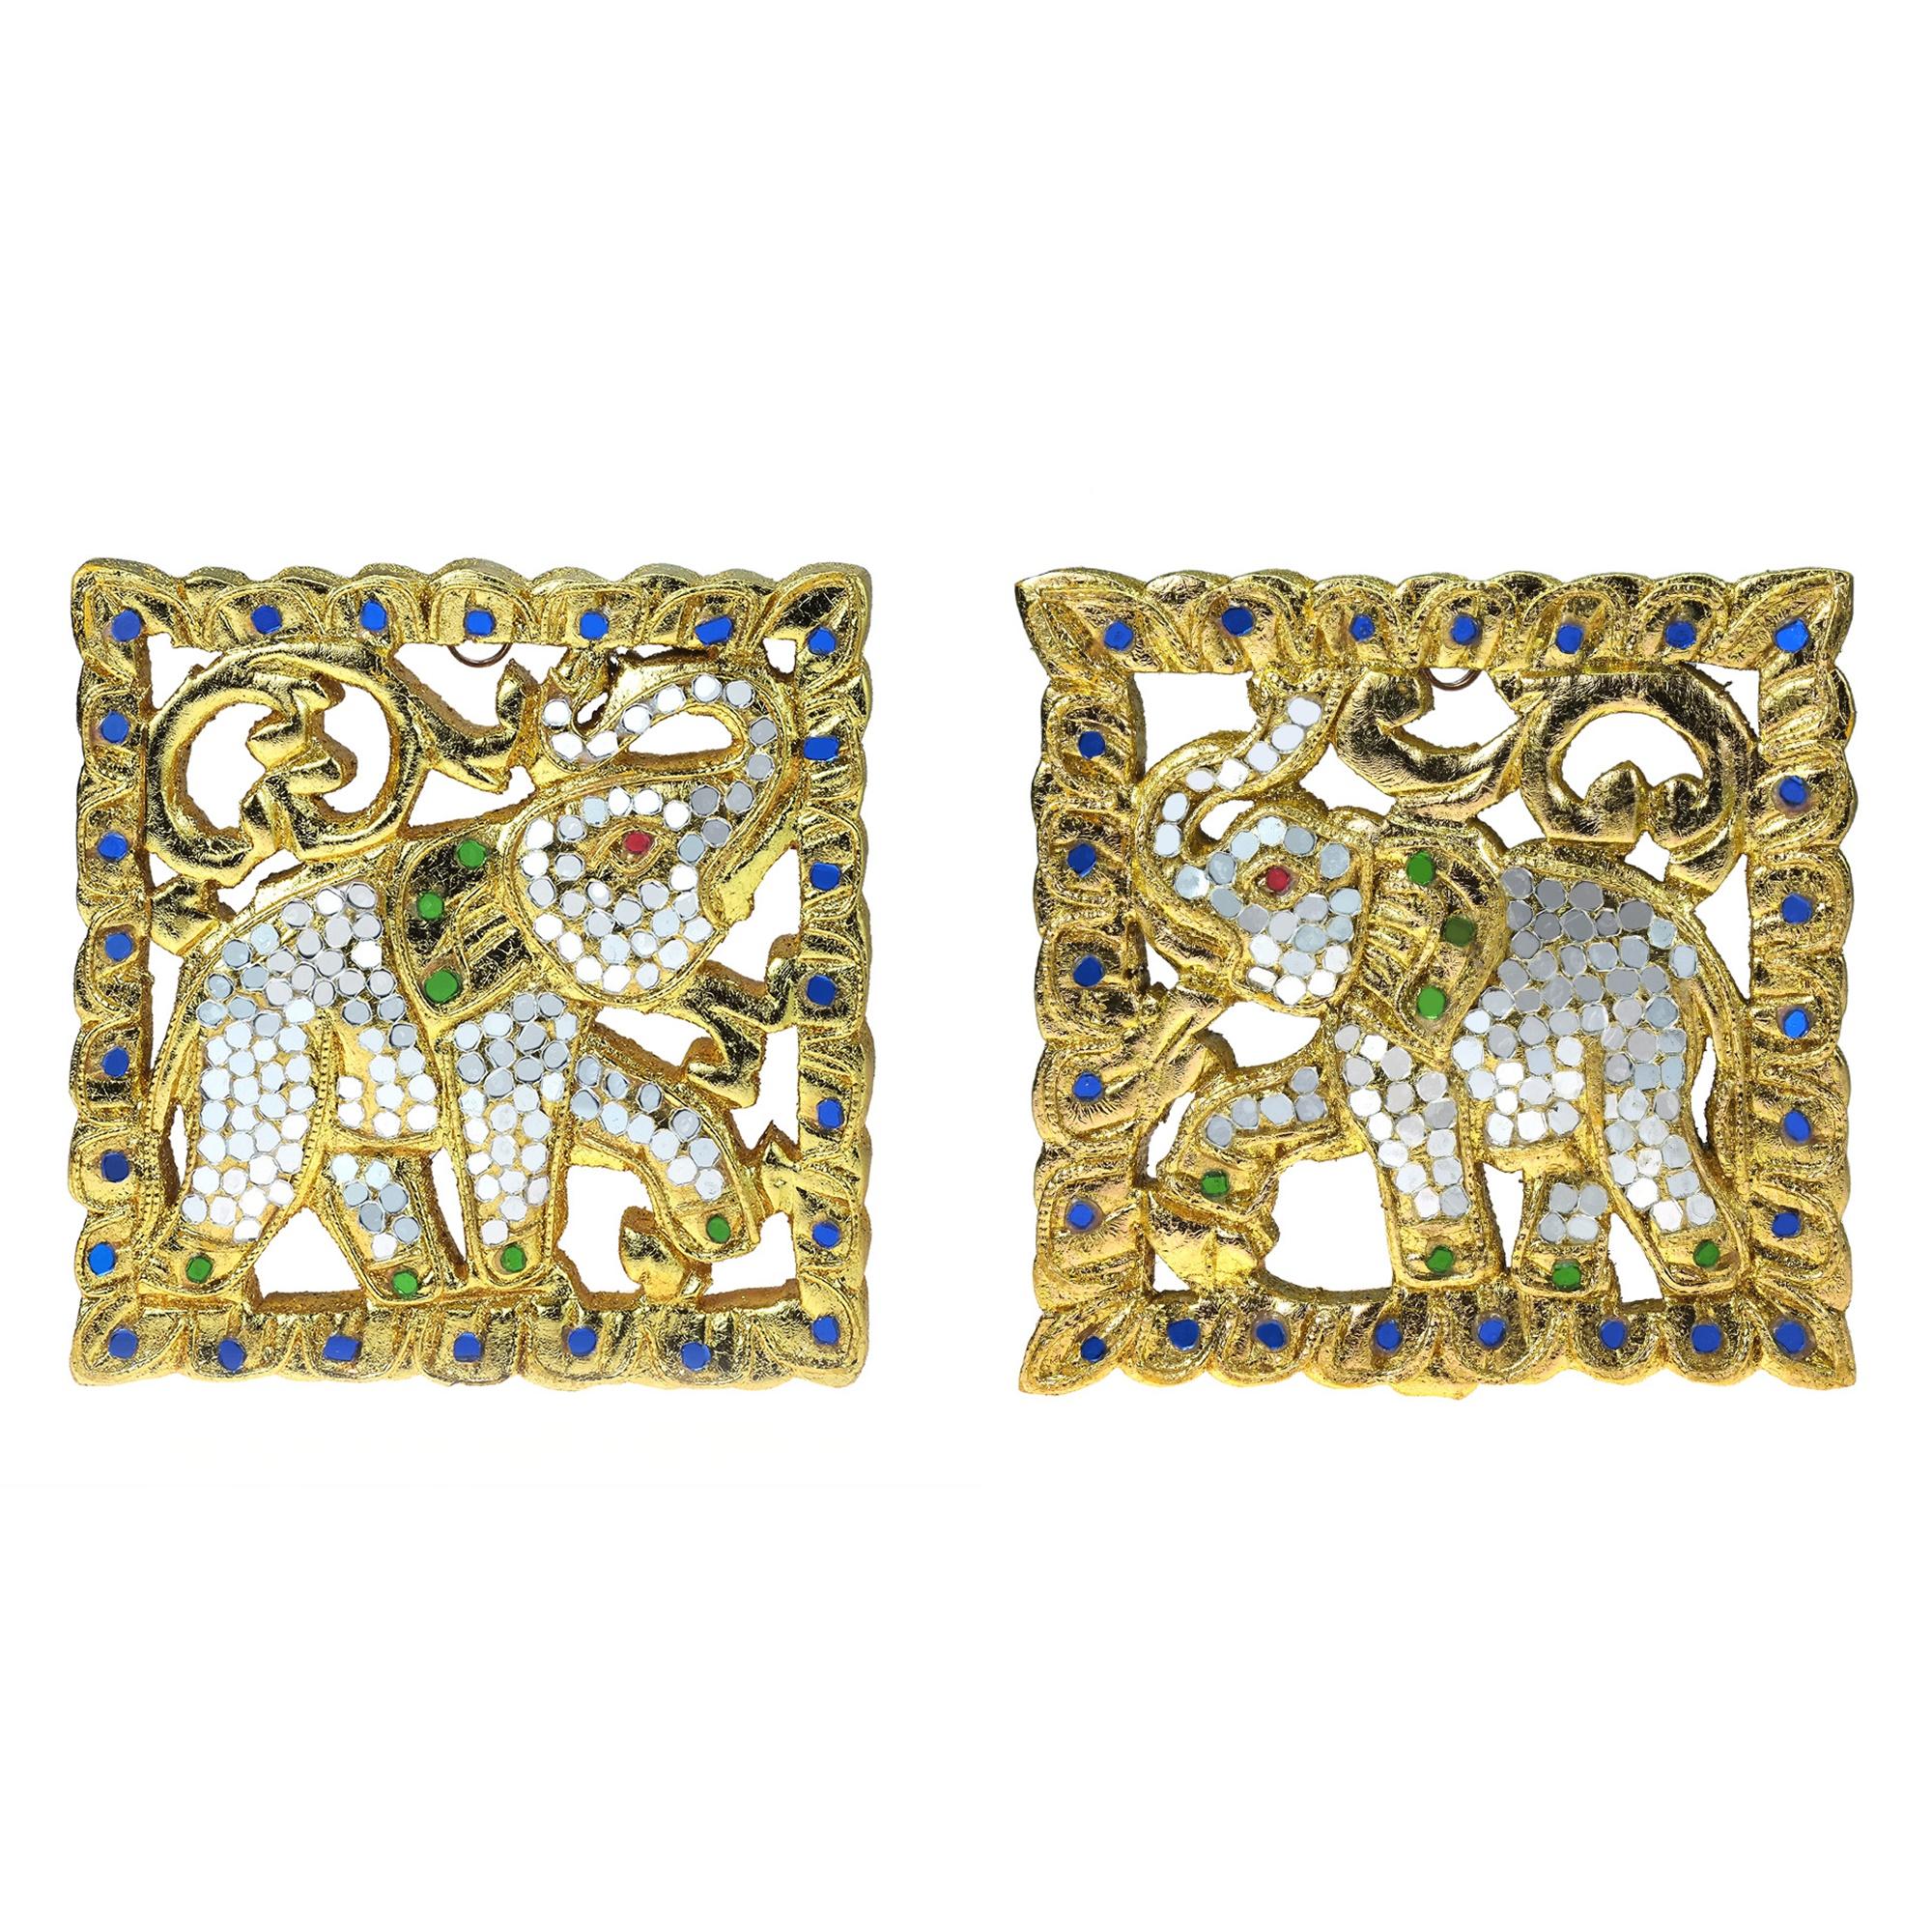 Gold Elephant Wall Decor : Set of two thai elephant gilded k gold leaf mosaic